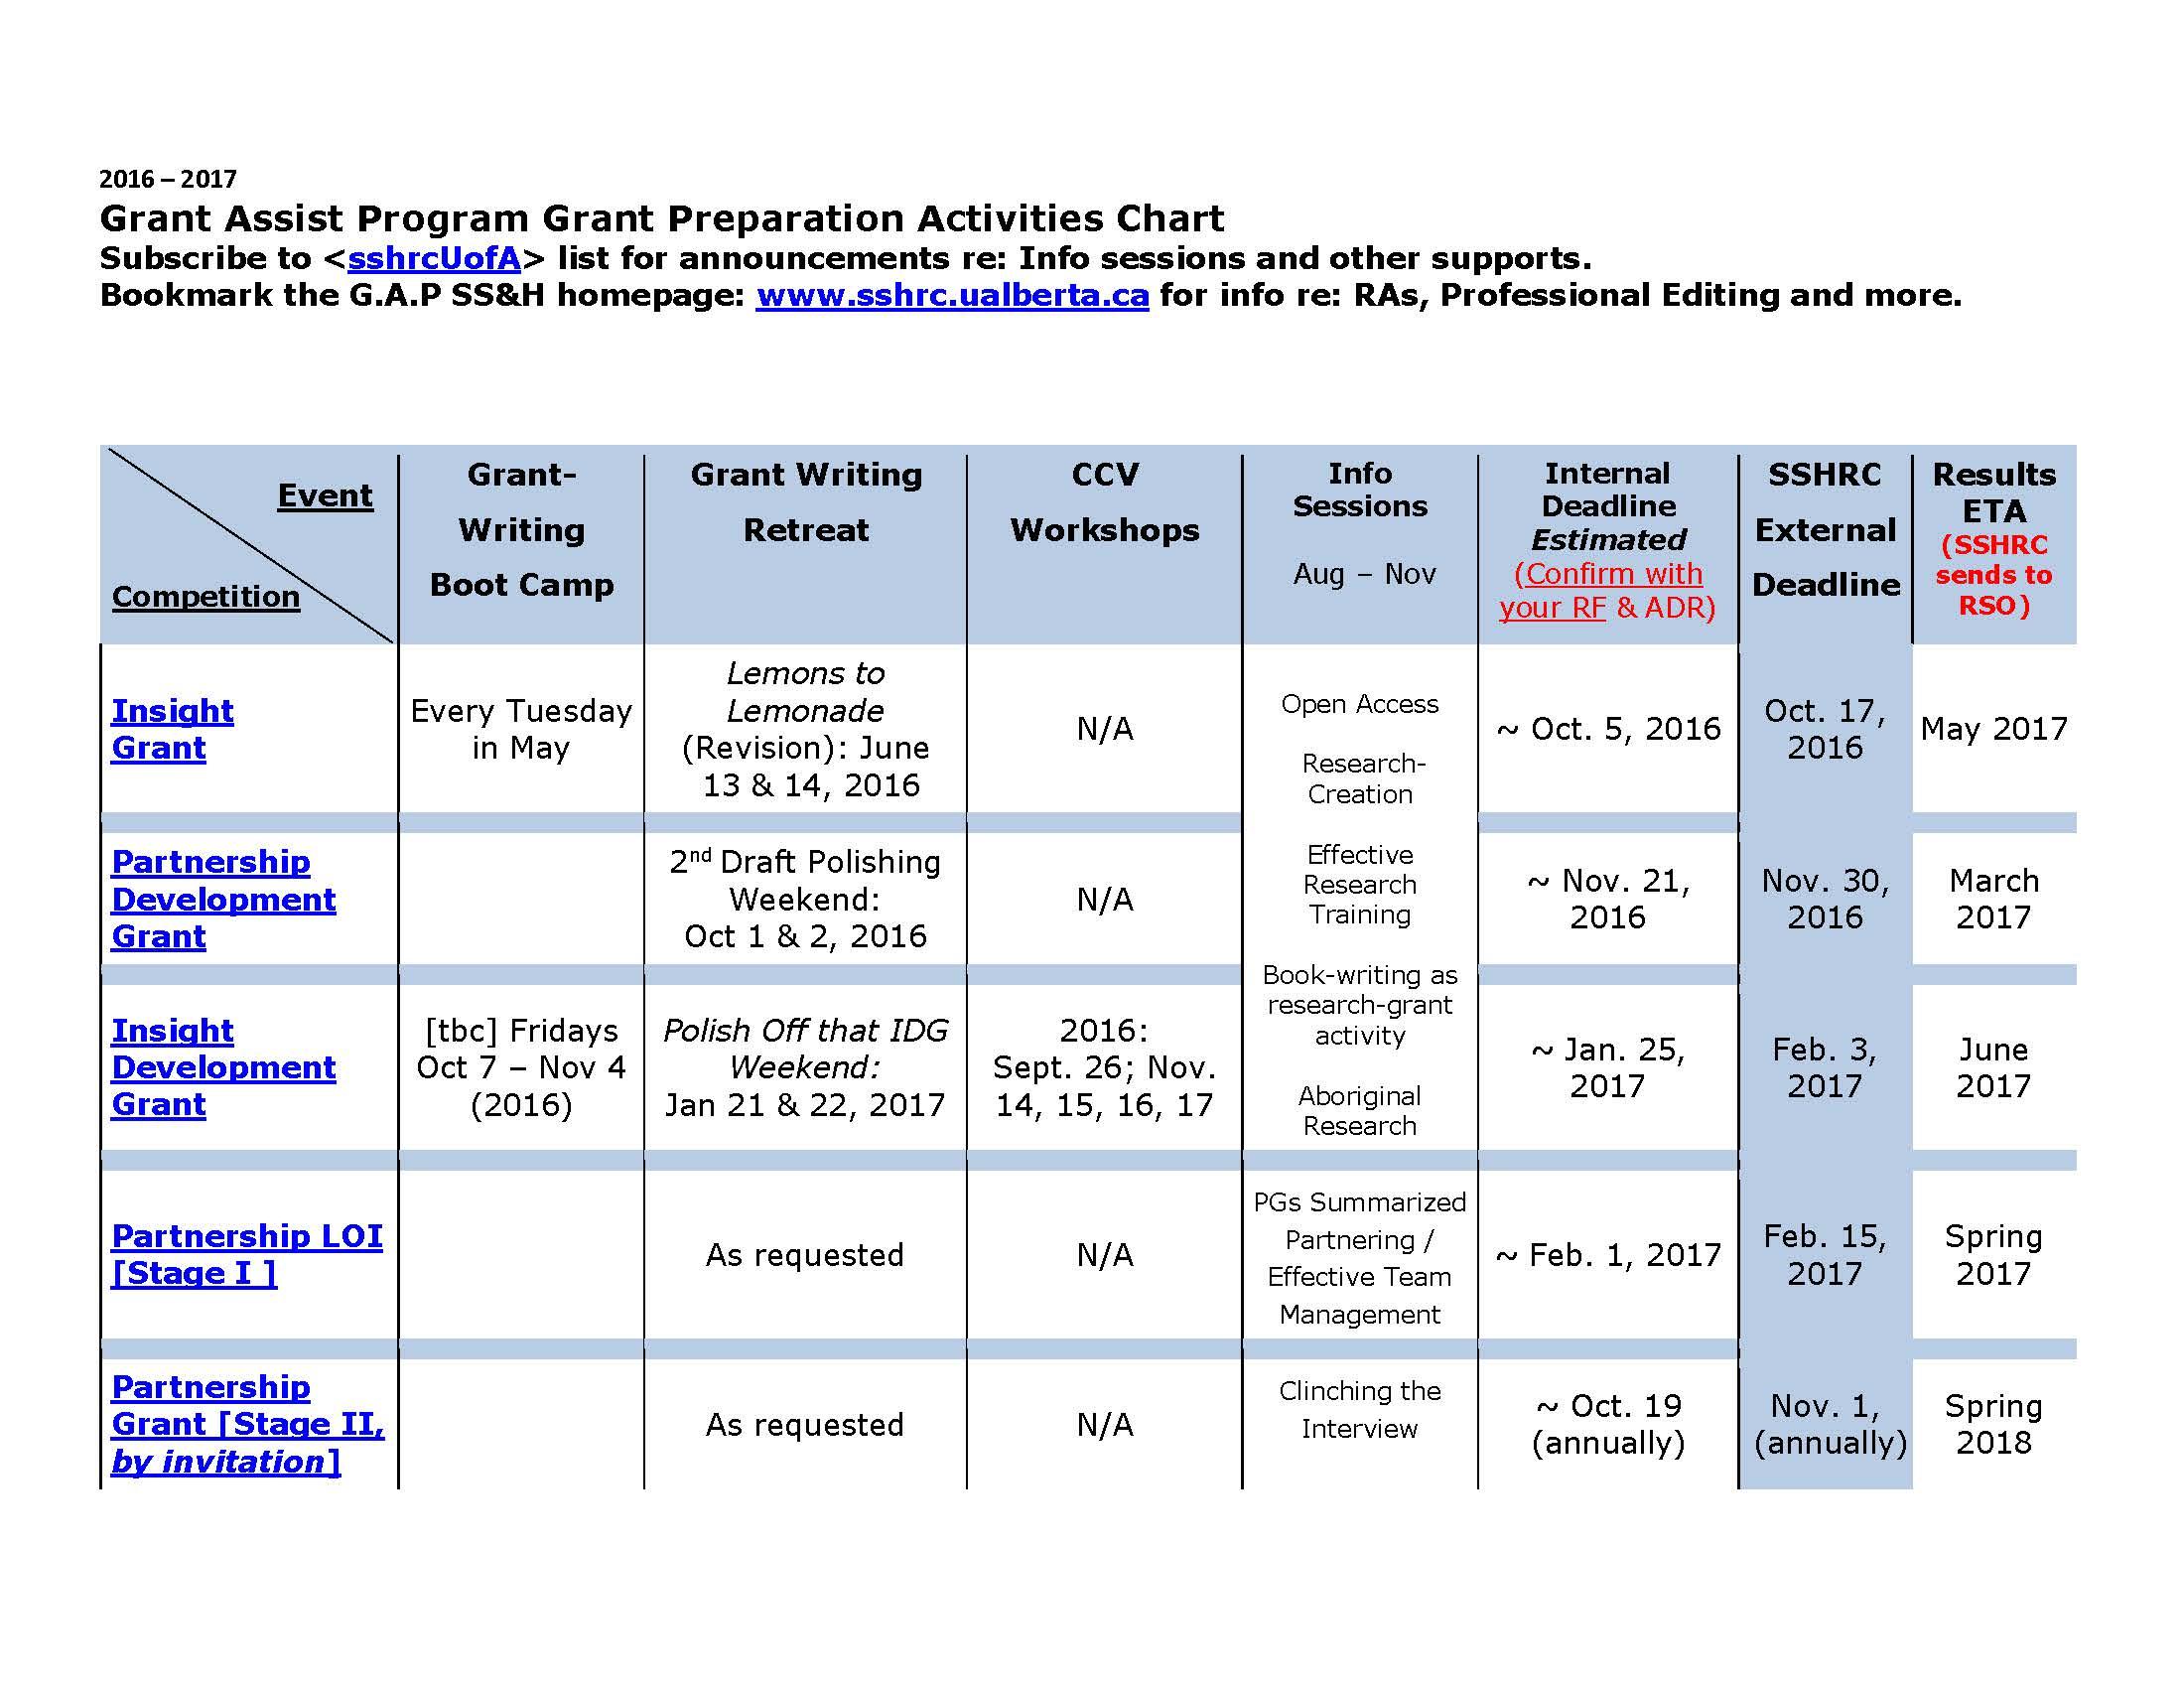 Grant Preparation Activities Chart